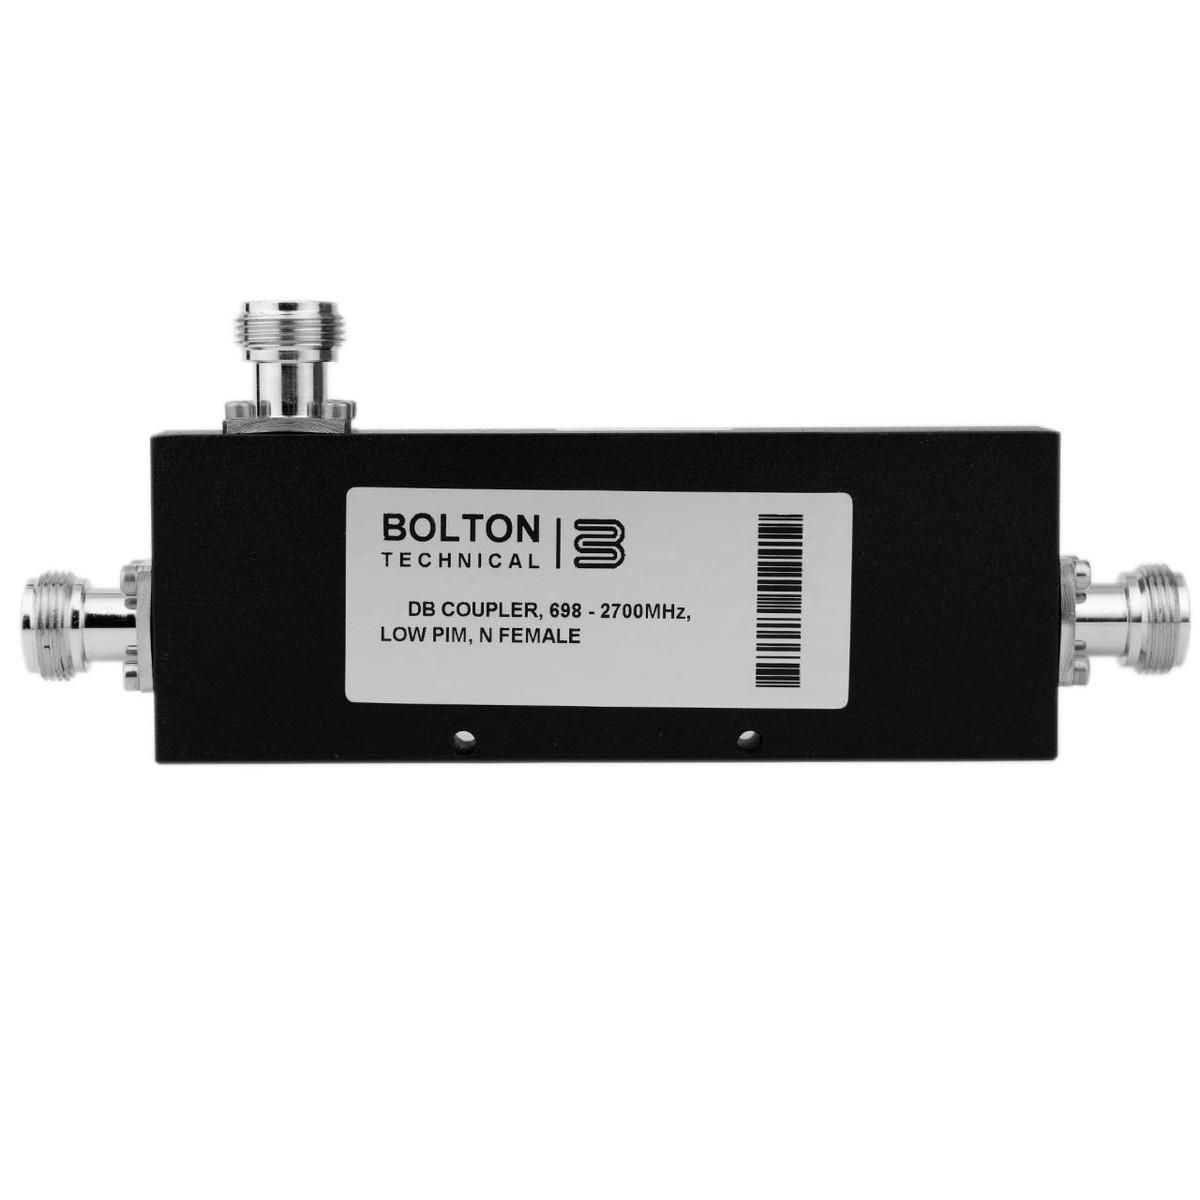 Bolton Tech Bolton Technical 10 dB Coupler, 698-2700 MHz, Low-PIM, N-Female